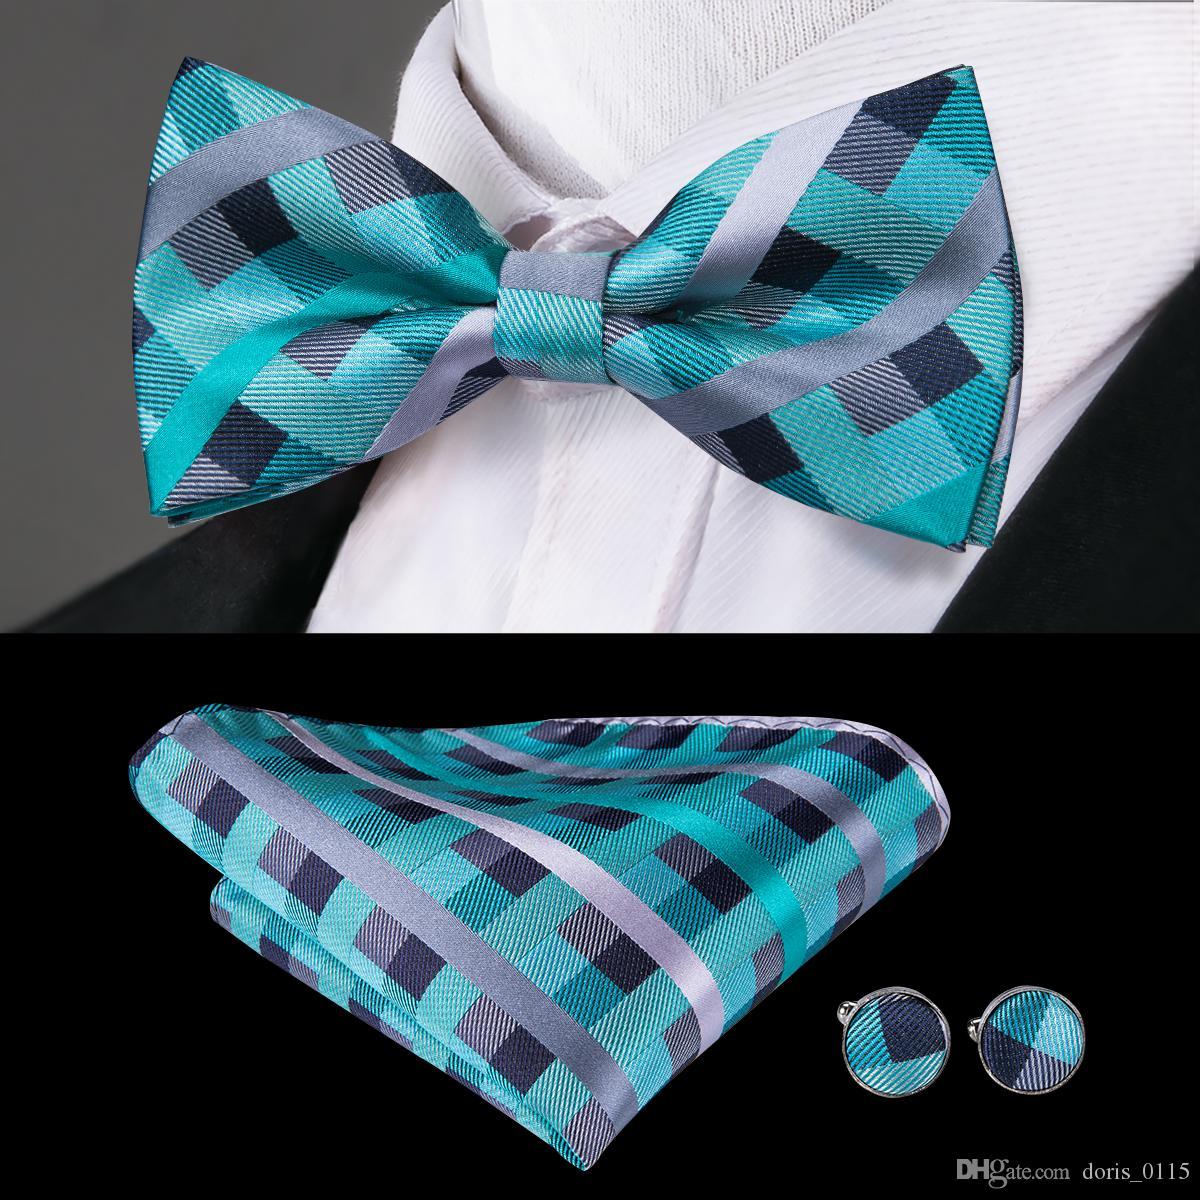 Hi-Tie Classic Blue Plaid Tie Set 100% Silk Bow Ties With Handkerchief Cufflinks For Men Business Wedding Formal Suit LH-794